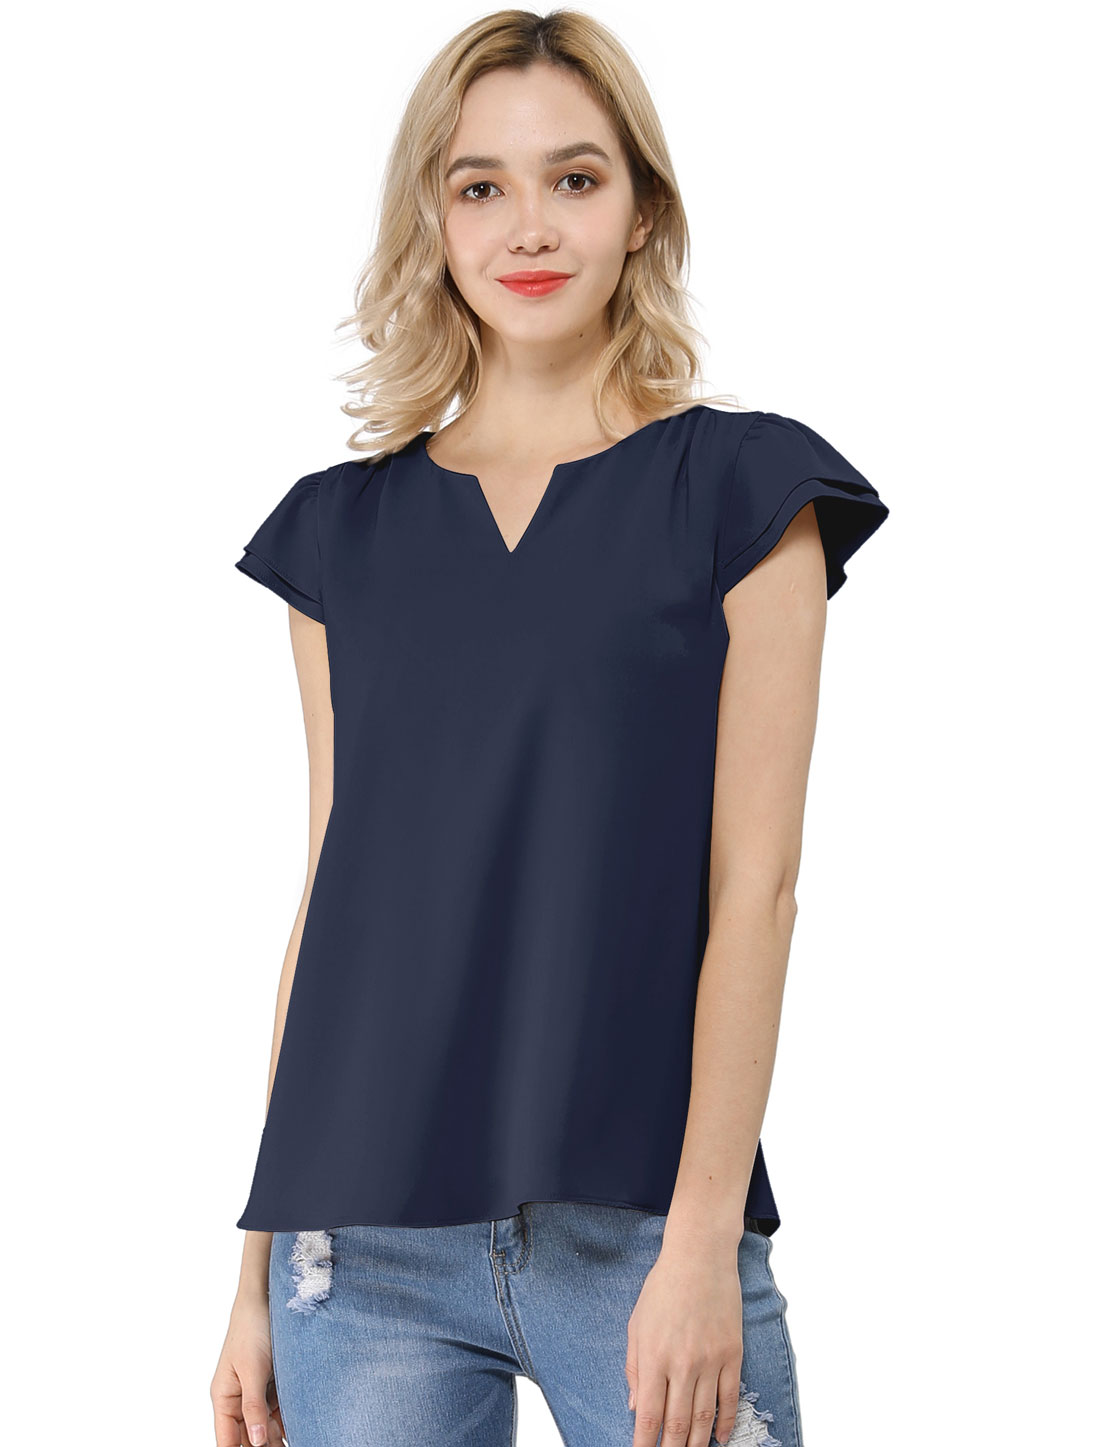 Allegra K Women's Work Business Casual Cap Sleeve Blouse Dark Blue L